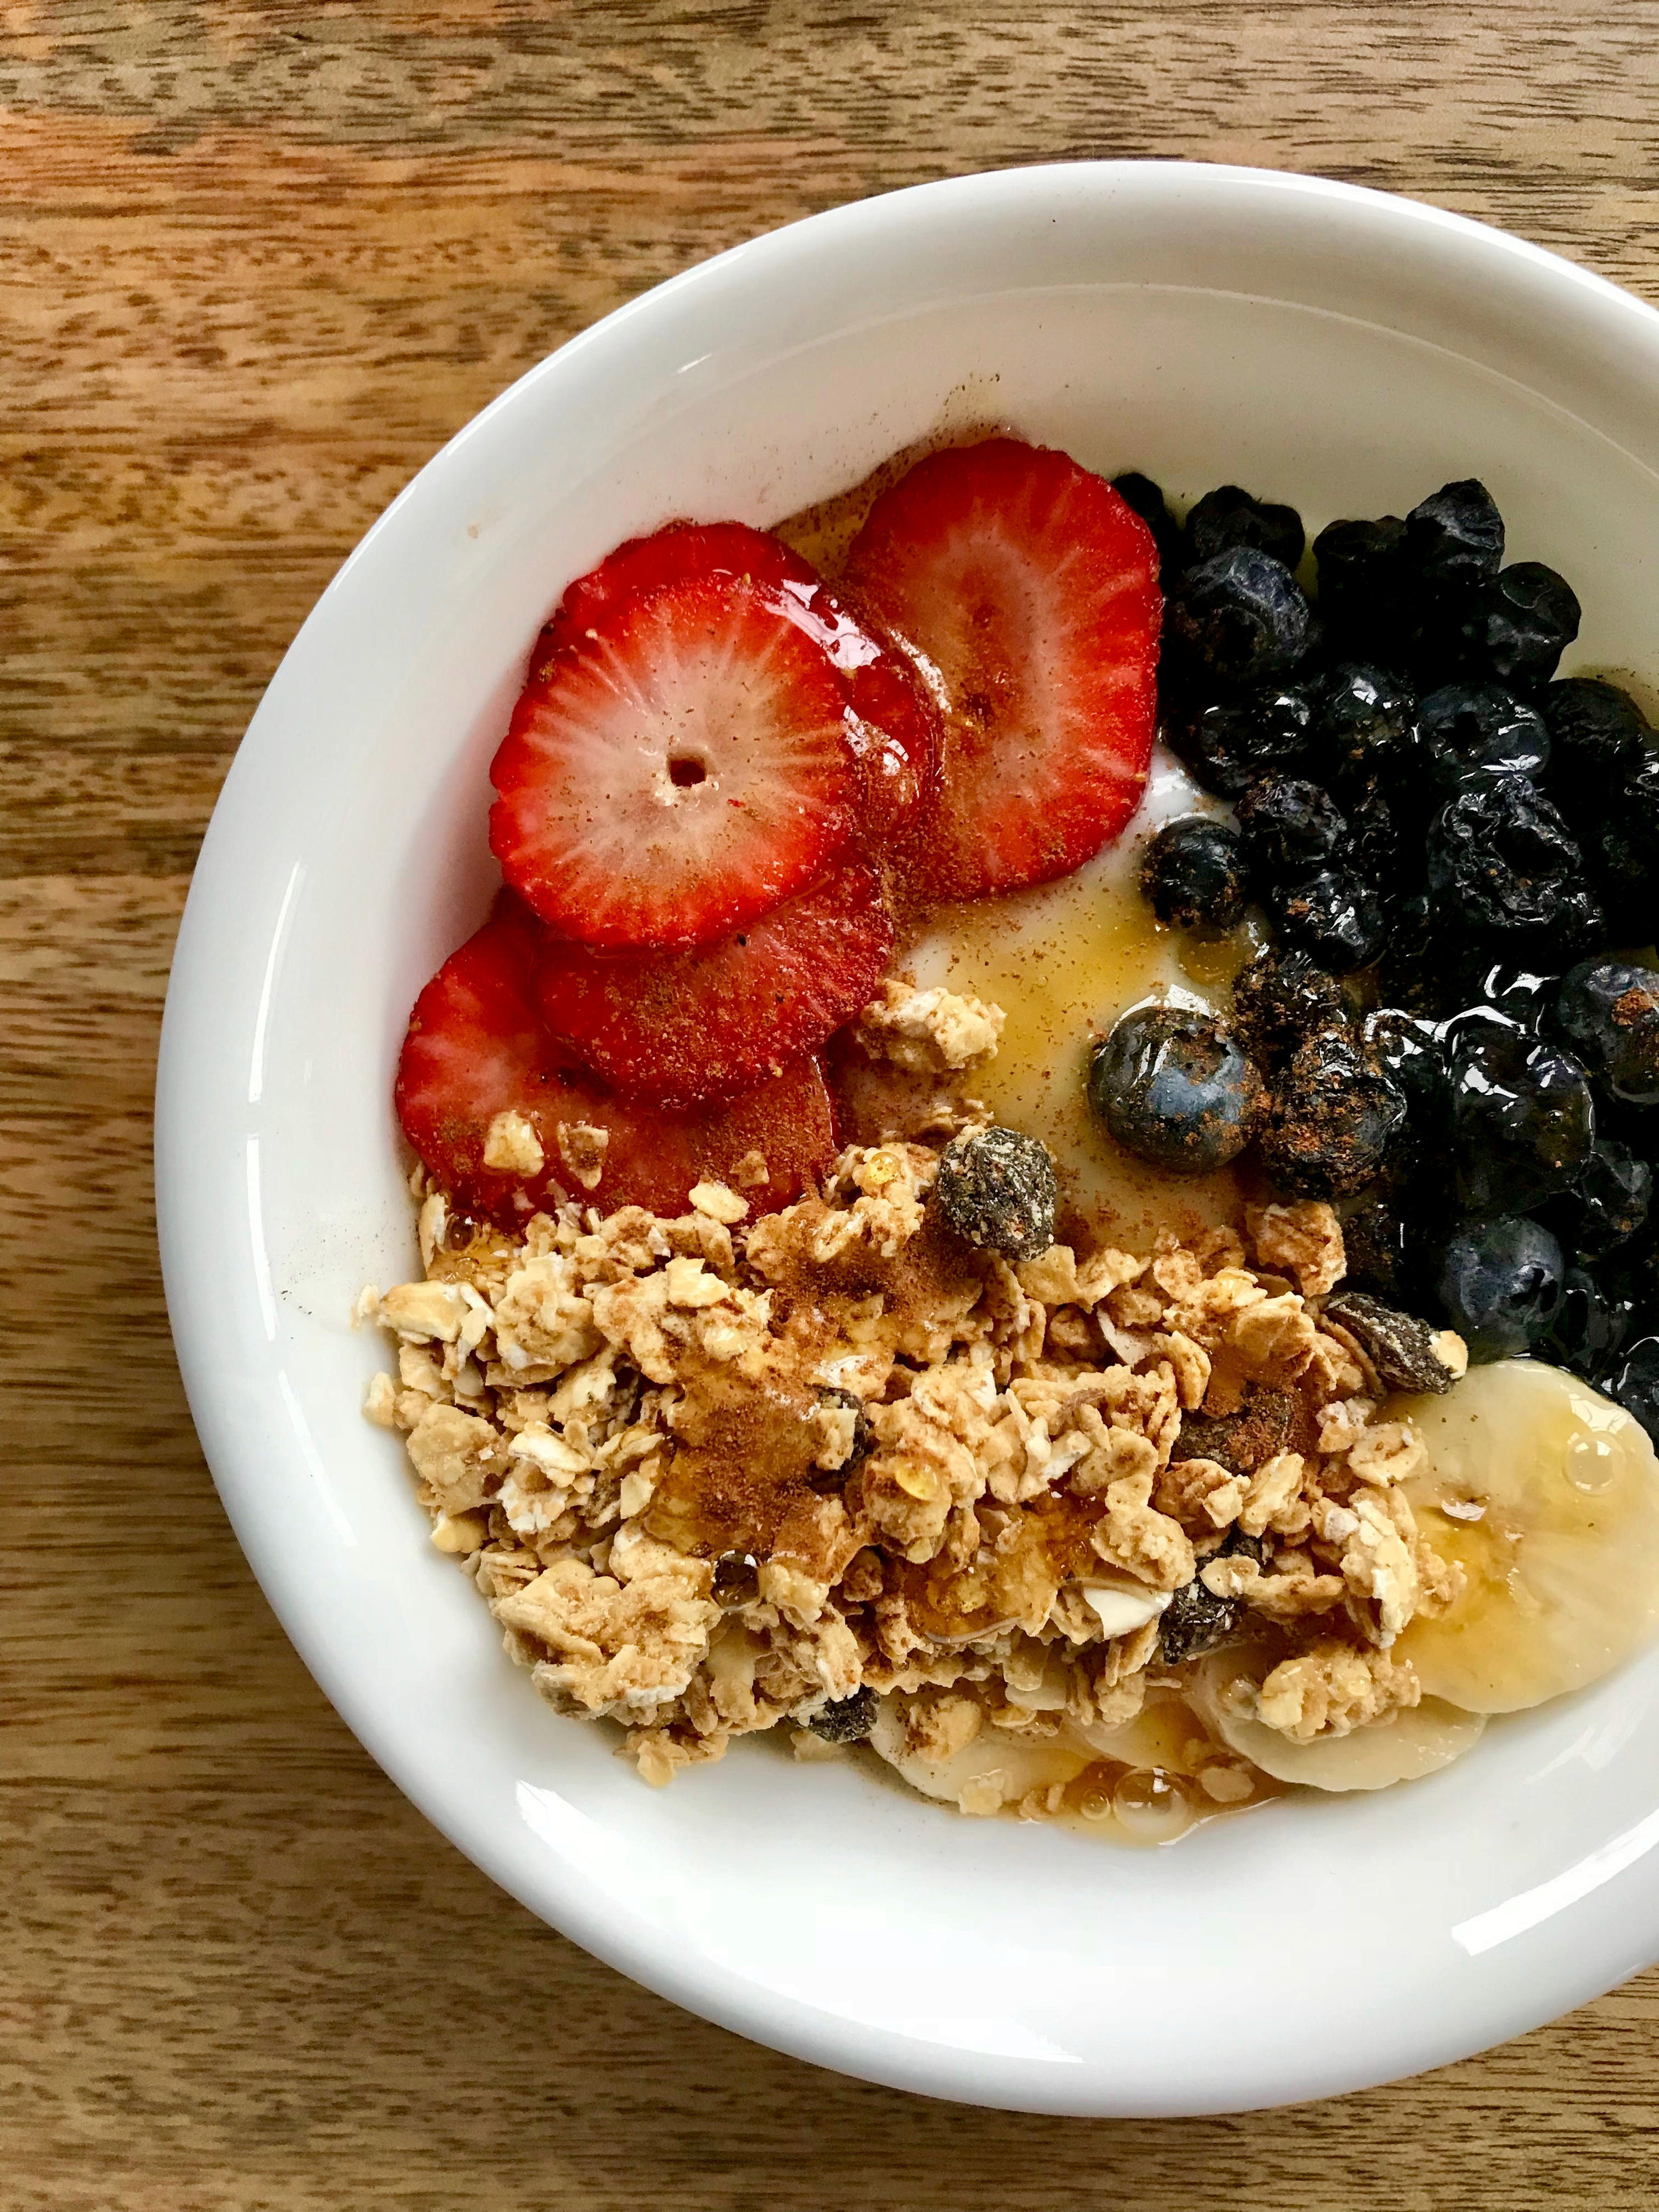 Fruit and granola yogurt bowl